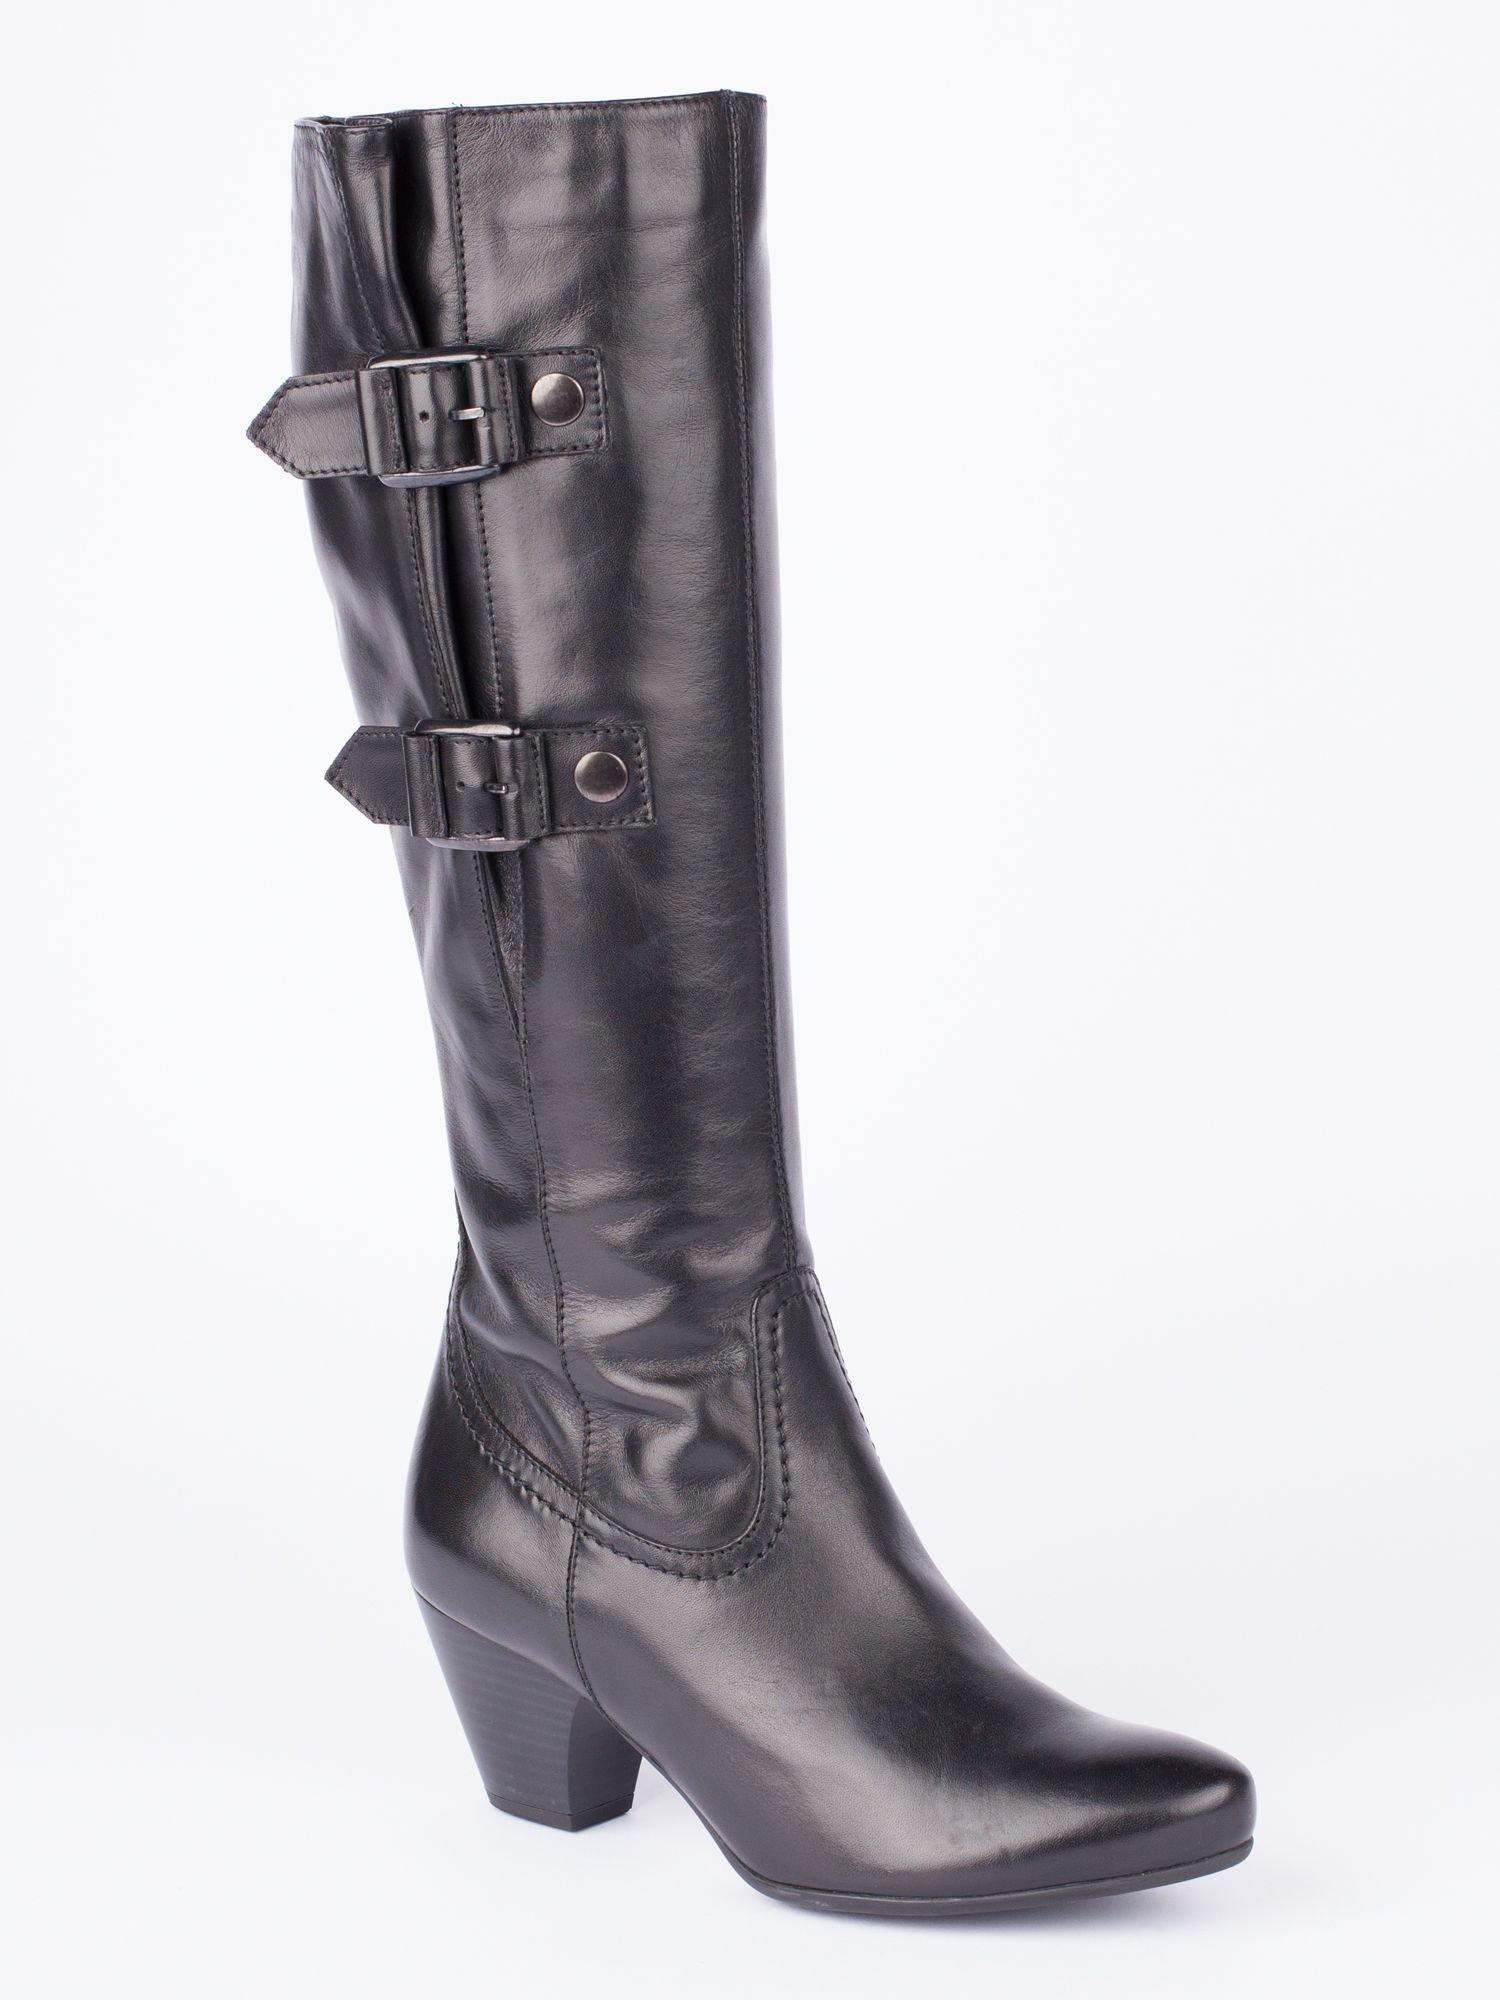 jones bootmaker ridley knee high boot in black lyst